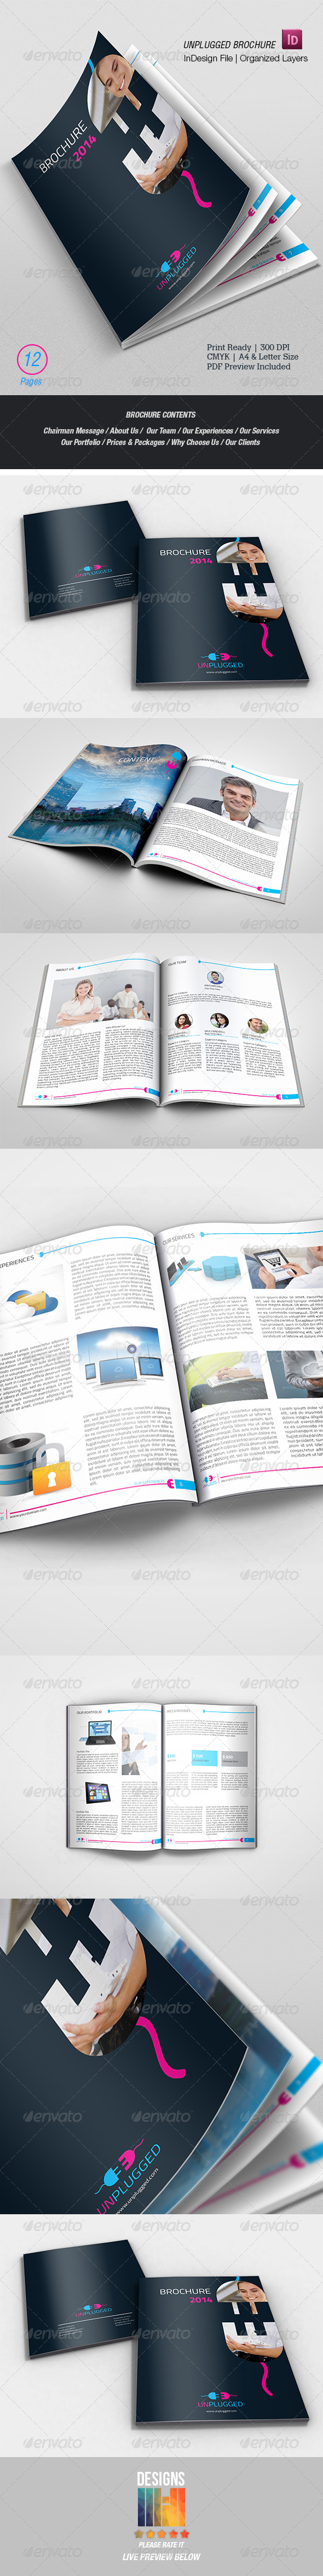 UnPlugged Multipurpose Brochure - Corporate Brochures